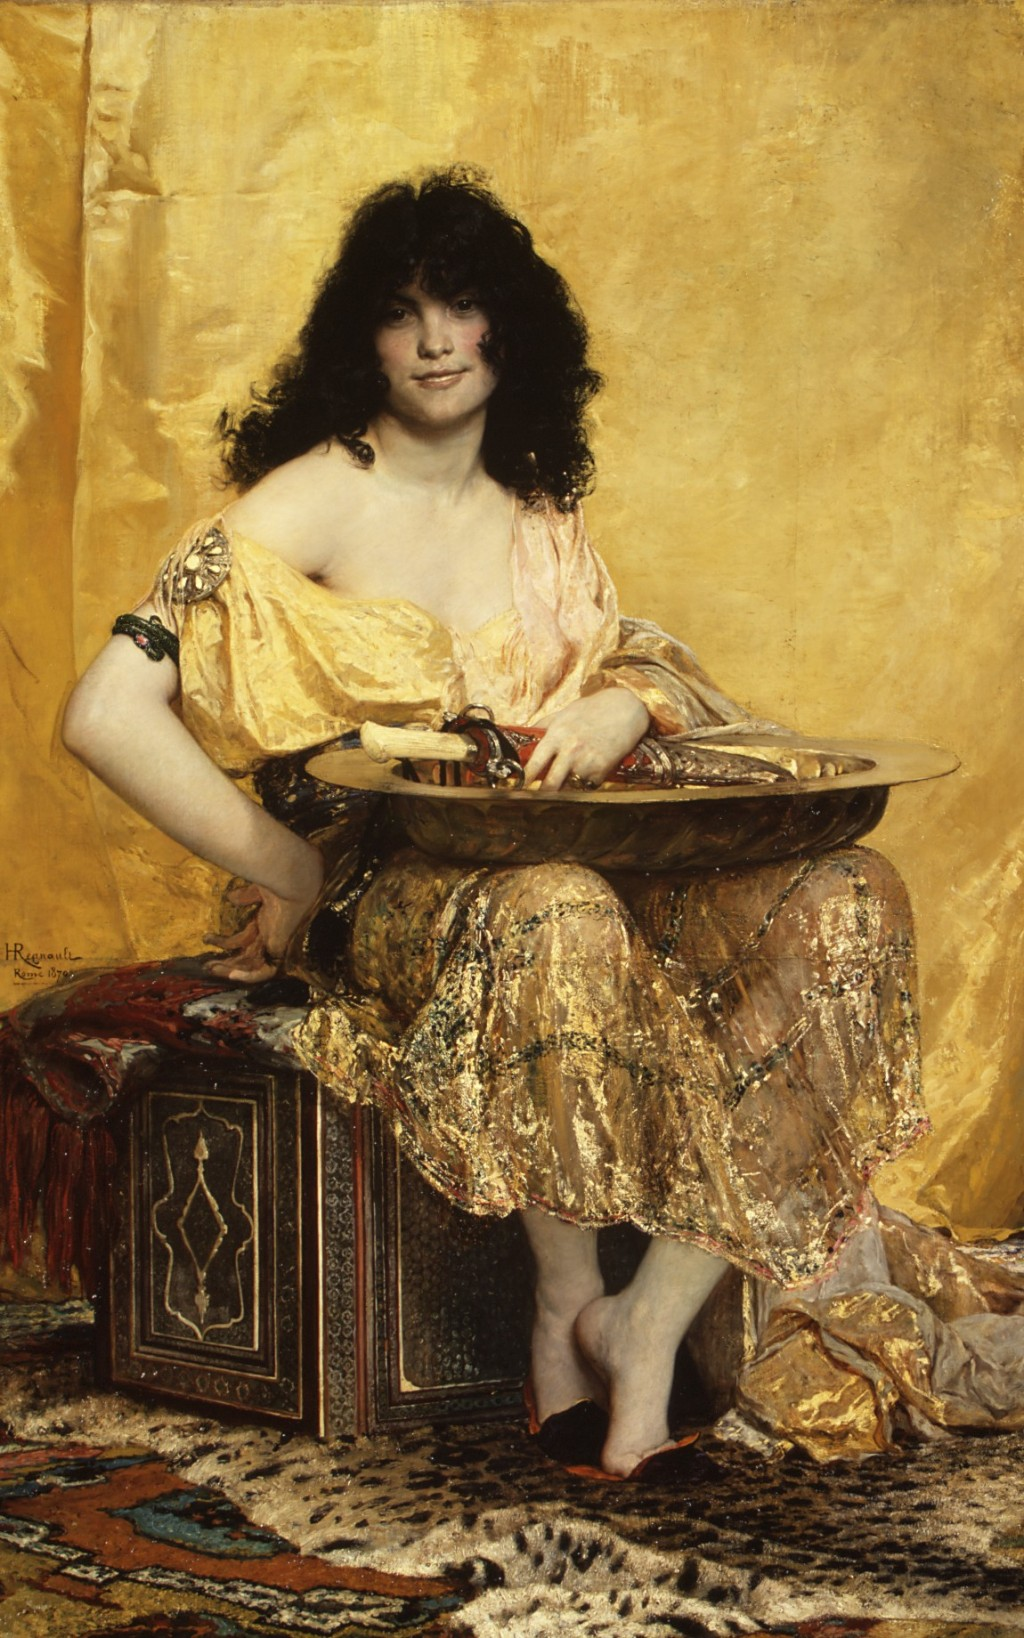 Henri Regnault (1843–1871), Salome (1870), oil on canvas, 160 × 101 cm, The Metropolitan Museum of Art (Gift of George F. Baker, 1916), New York, NY. Courtesy of The Metropolitan Museum of Art.